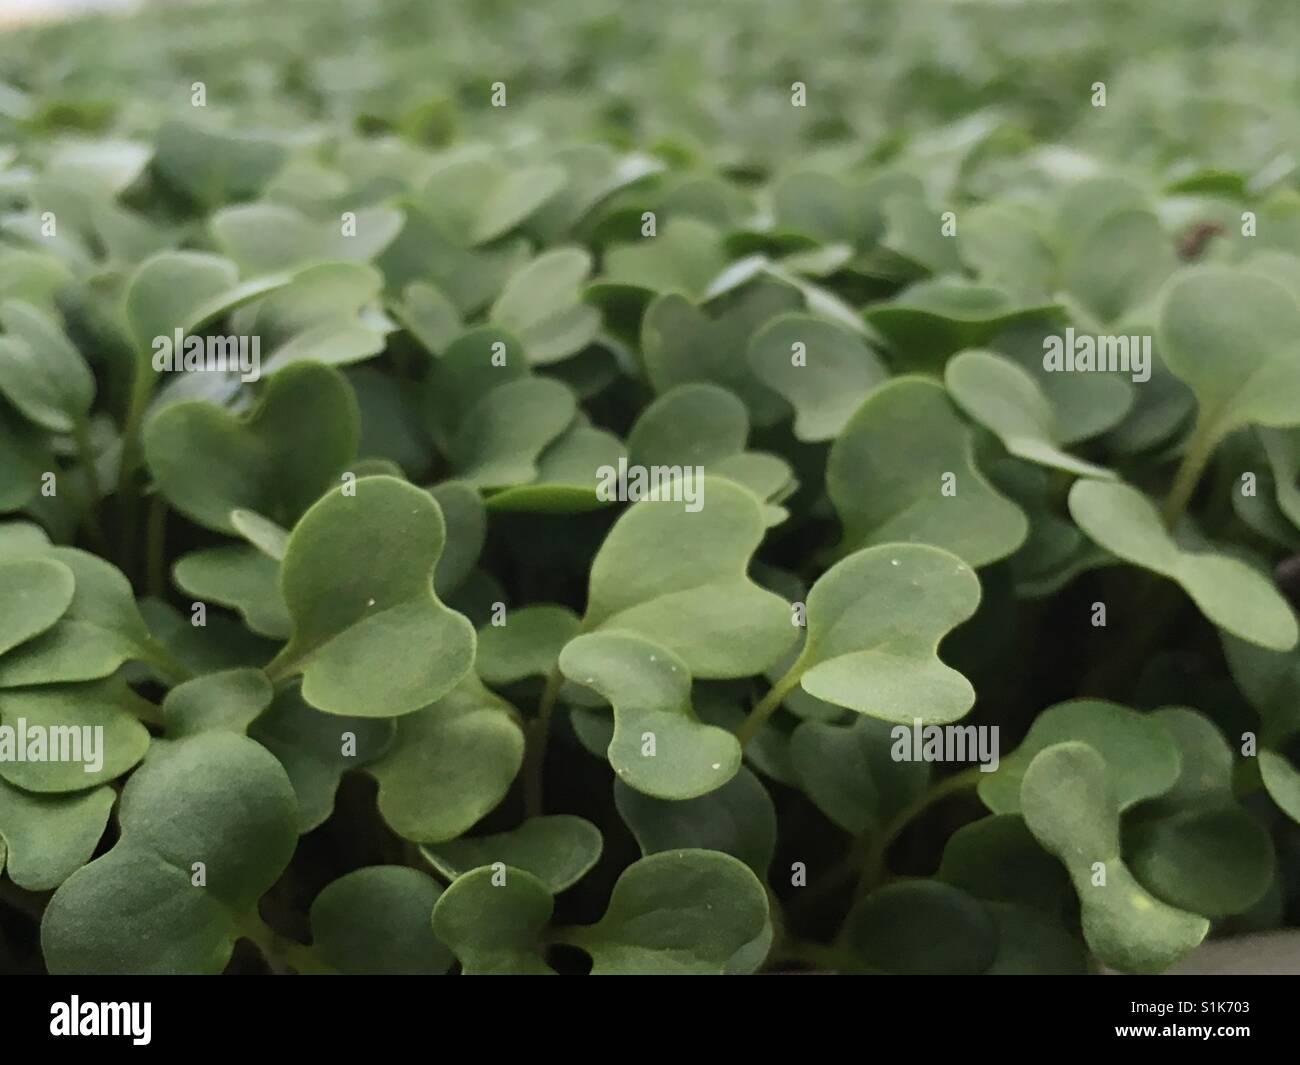 hojas, naturaleza, artístico, textura, leaves, nature, artistic, green, verde, texture, plants, plantas, cosecha, - Stock Image